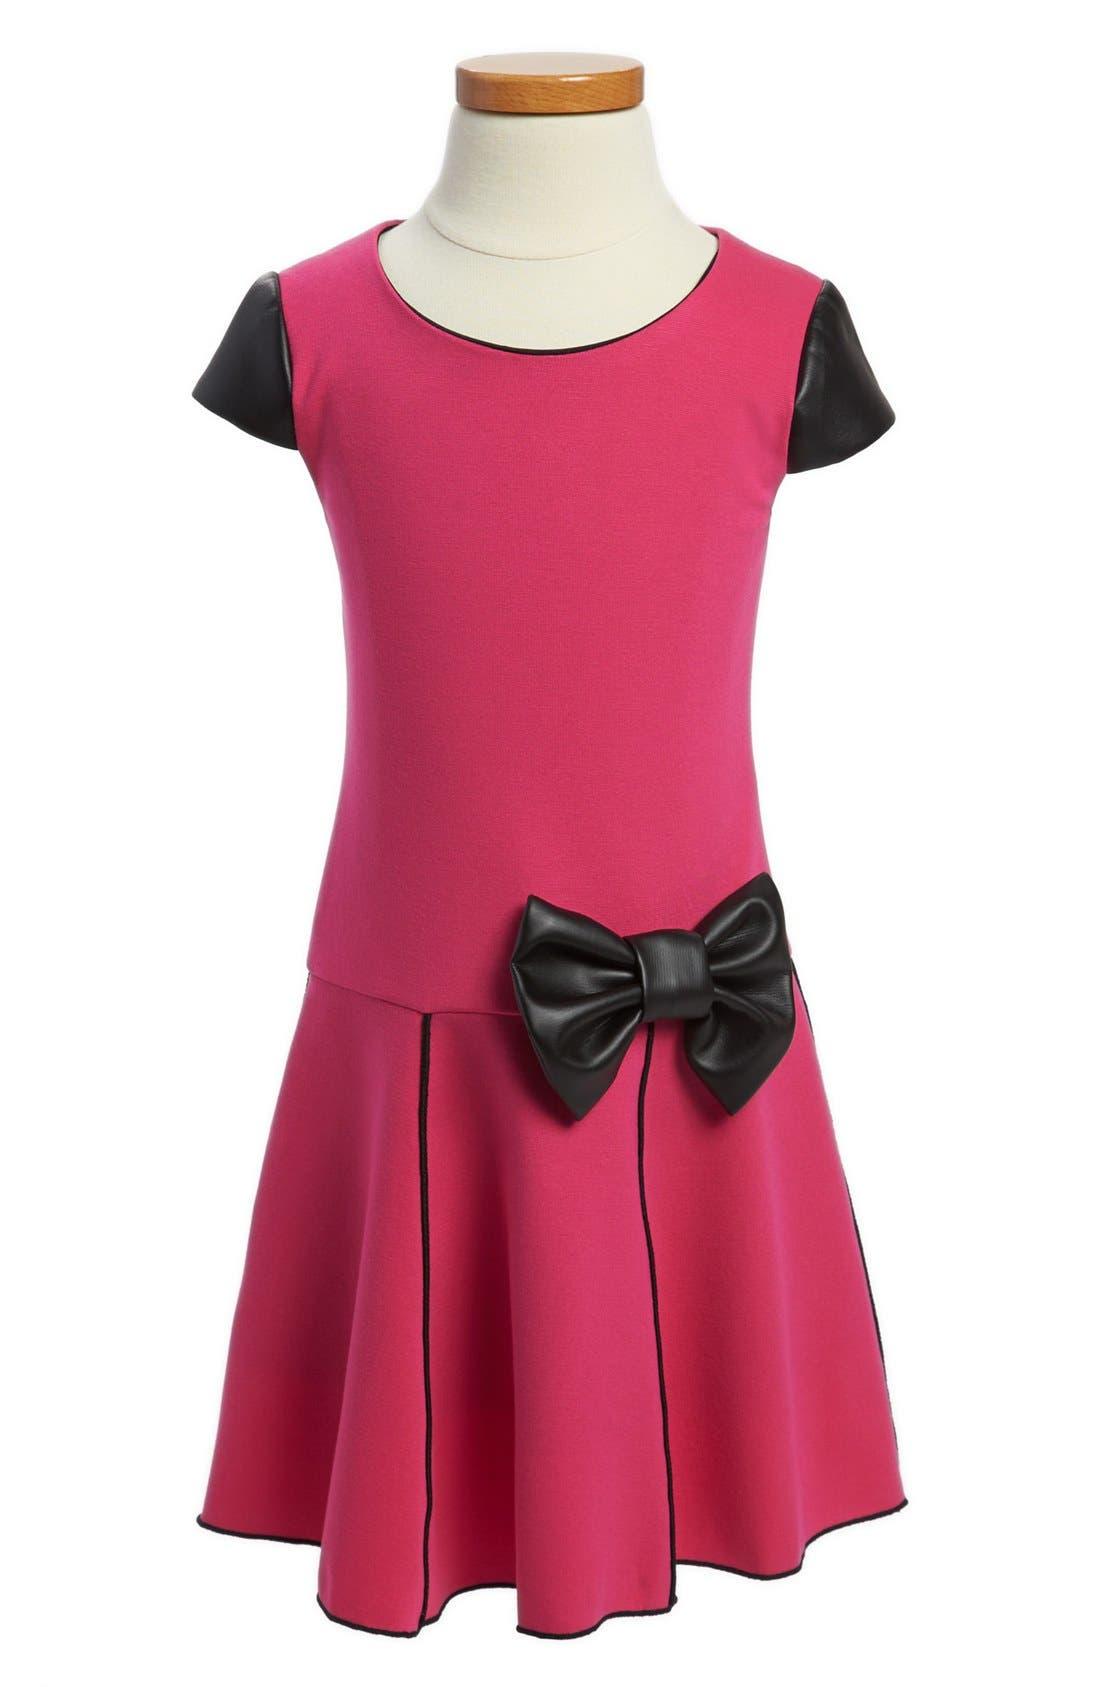 Main Image - Zoe Ltd Faux Leather Trim Dress (Little Girls & Big Girls)